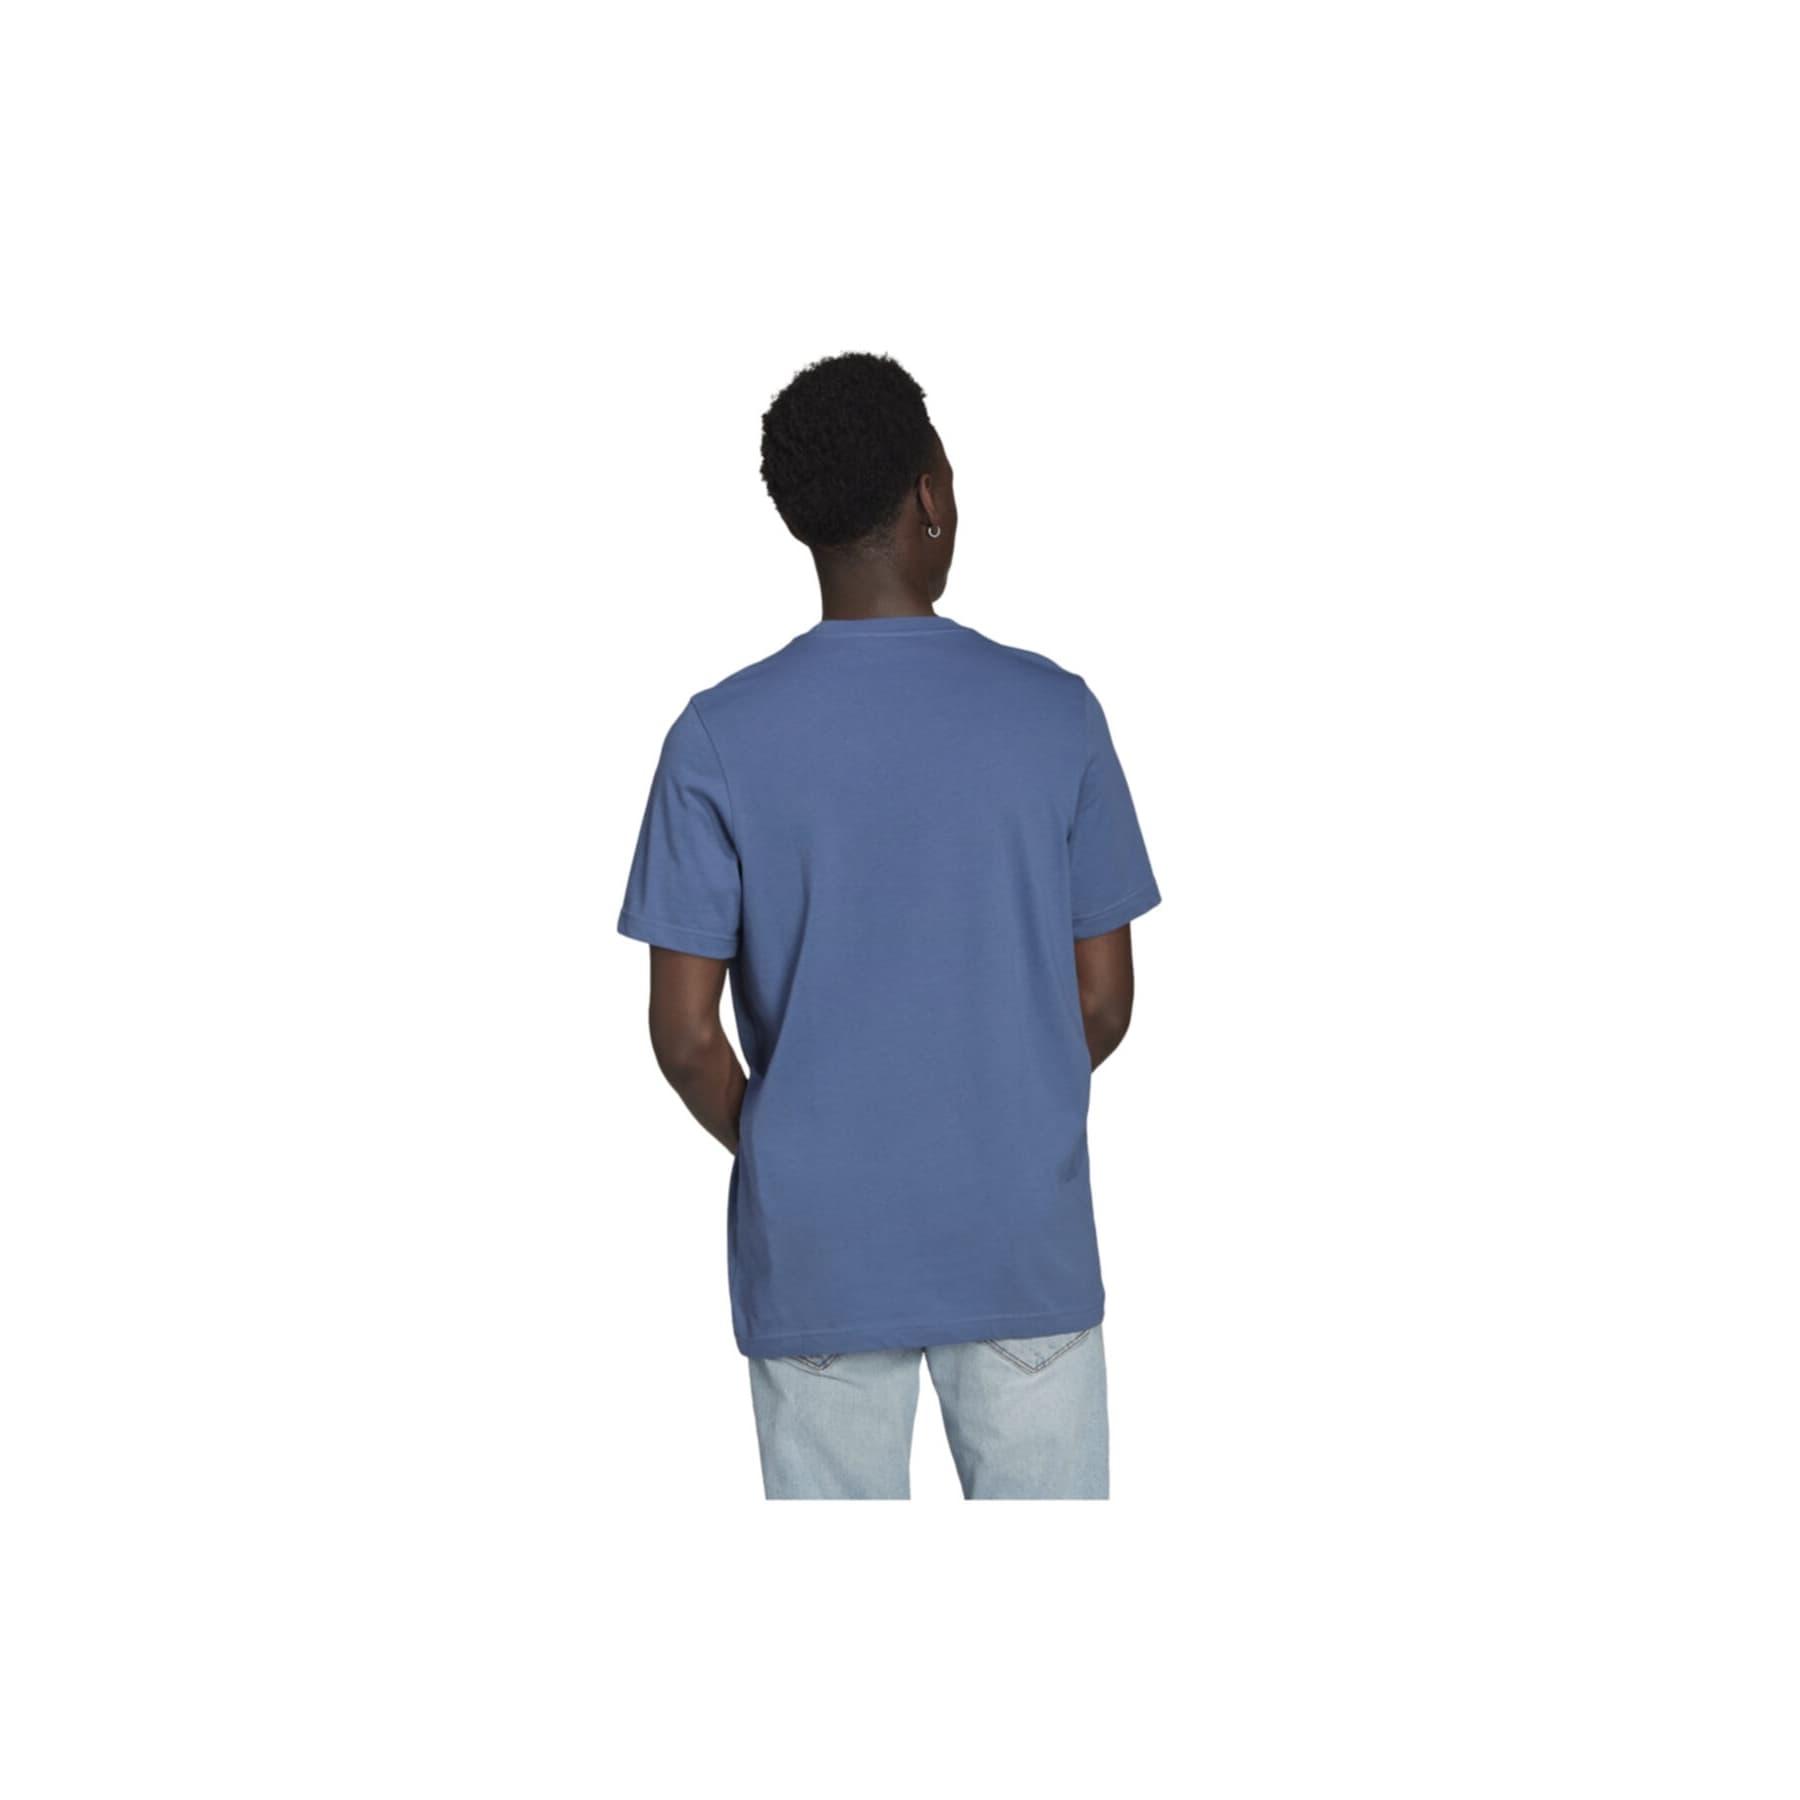 Adicolor Classics Trefoil Erkek Mavi Tişört (GN3467)